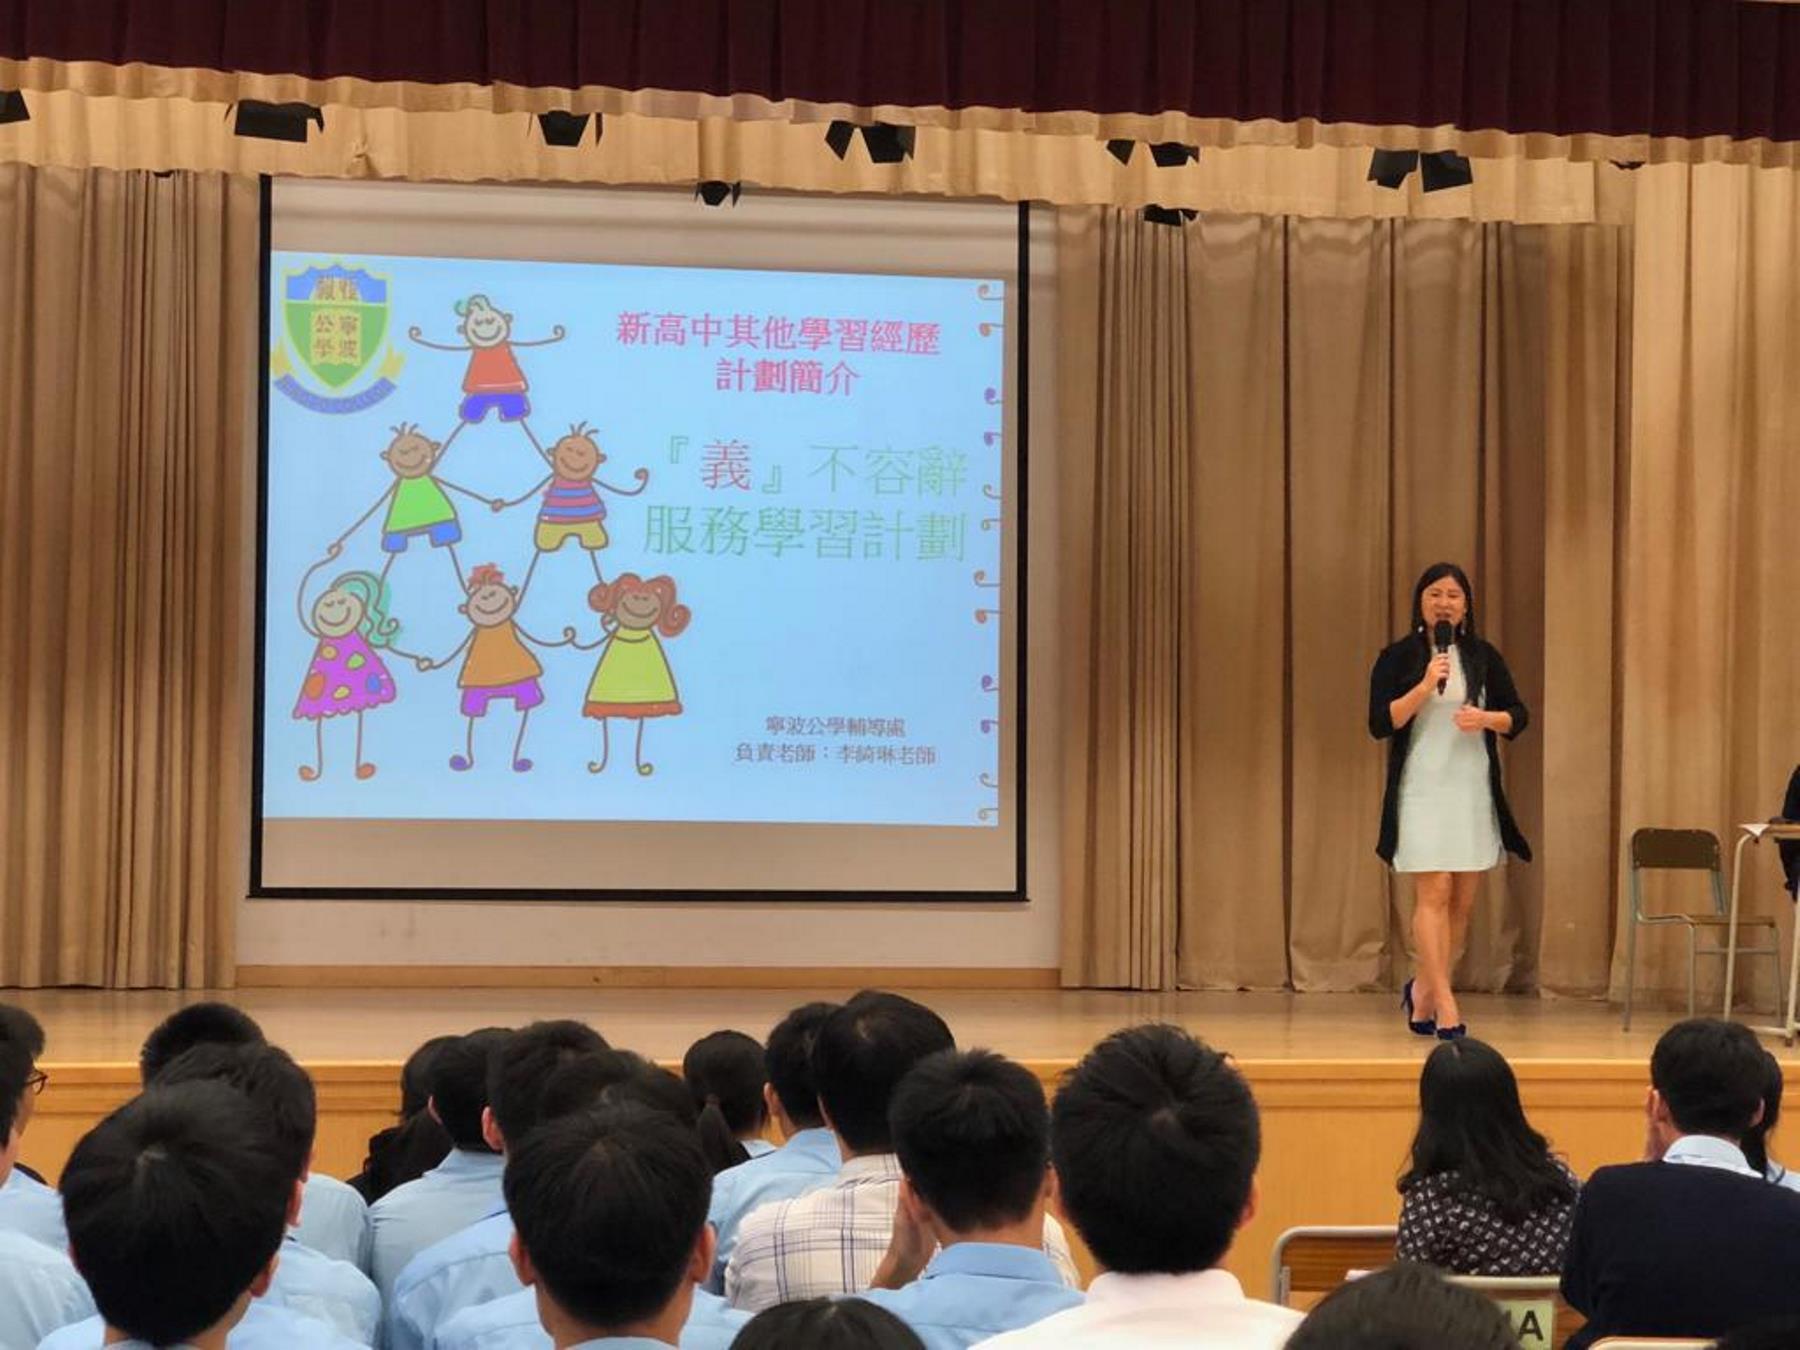 http://npc.edu.hk/sites/default/files/4_17.jpeg